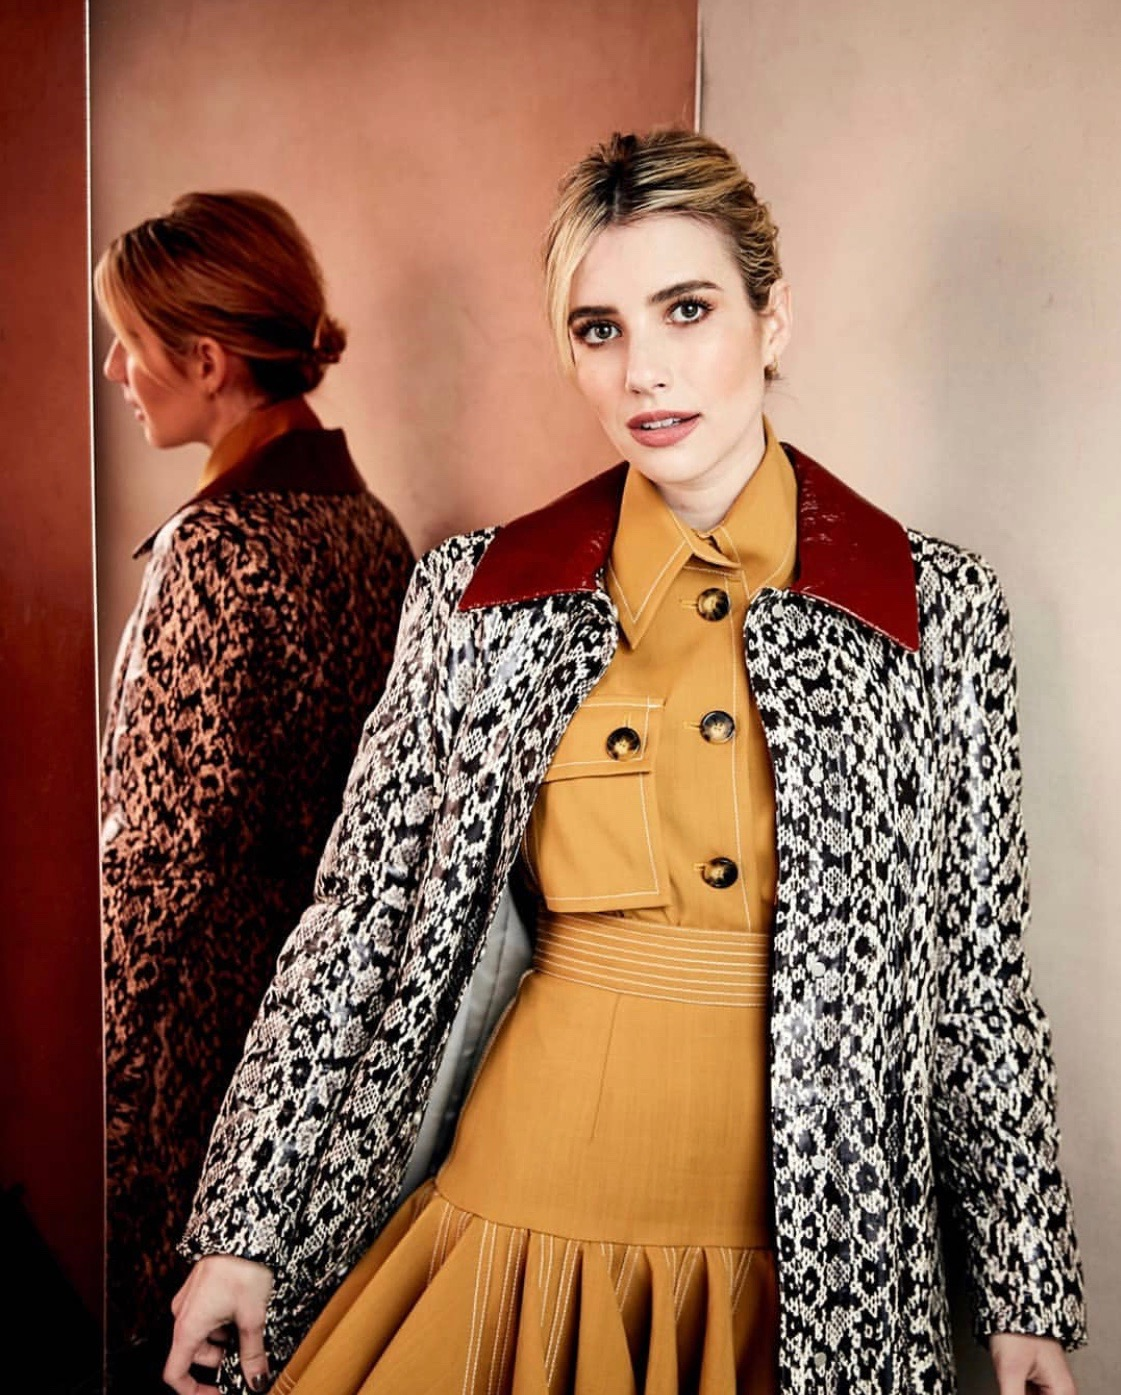 Emma Roberts Sundance Filmfestival Makeup by Nikki DeRoest